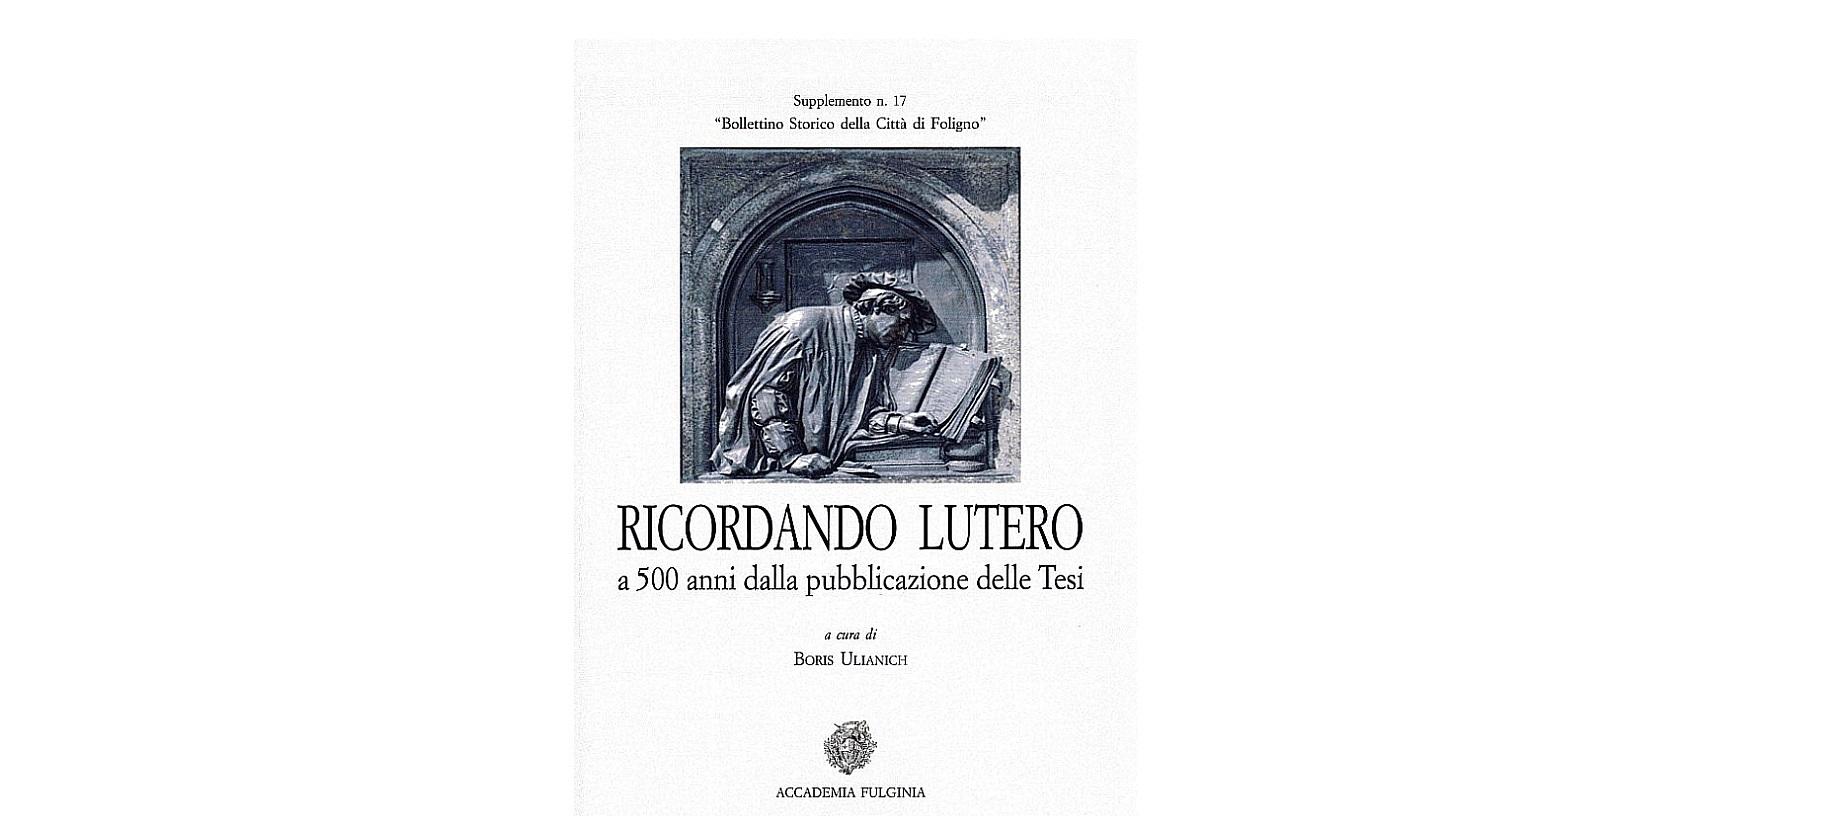 Lutero_Testata